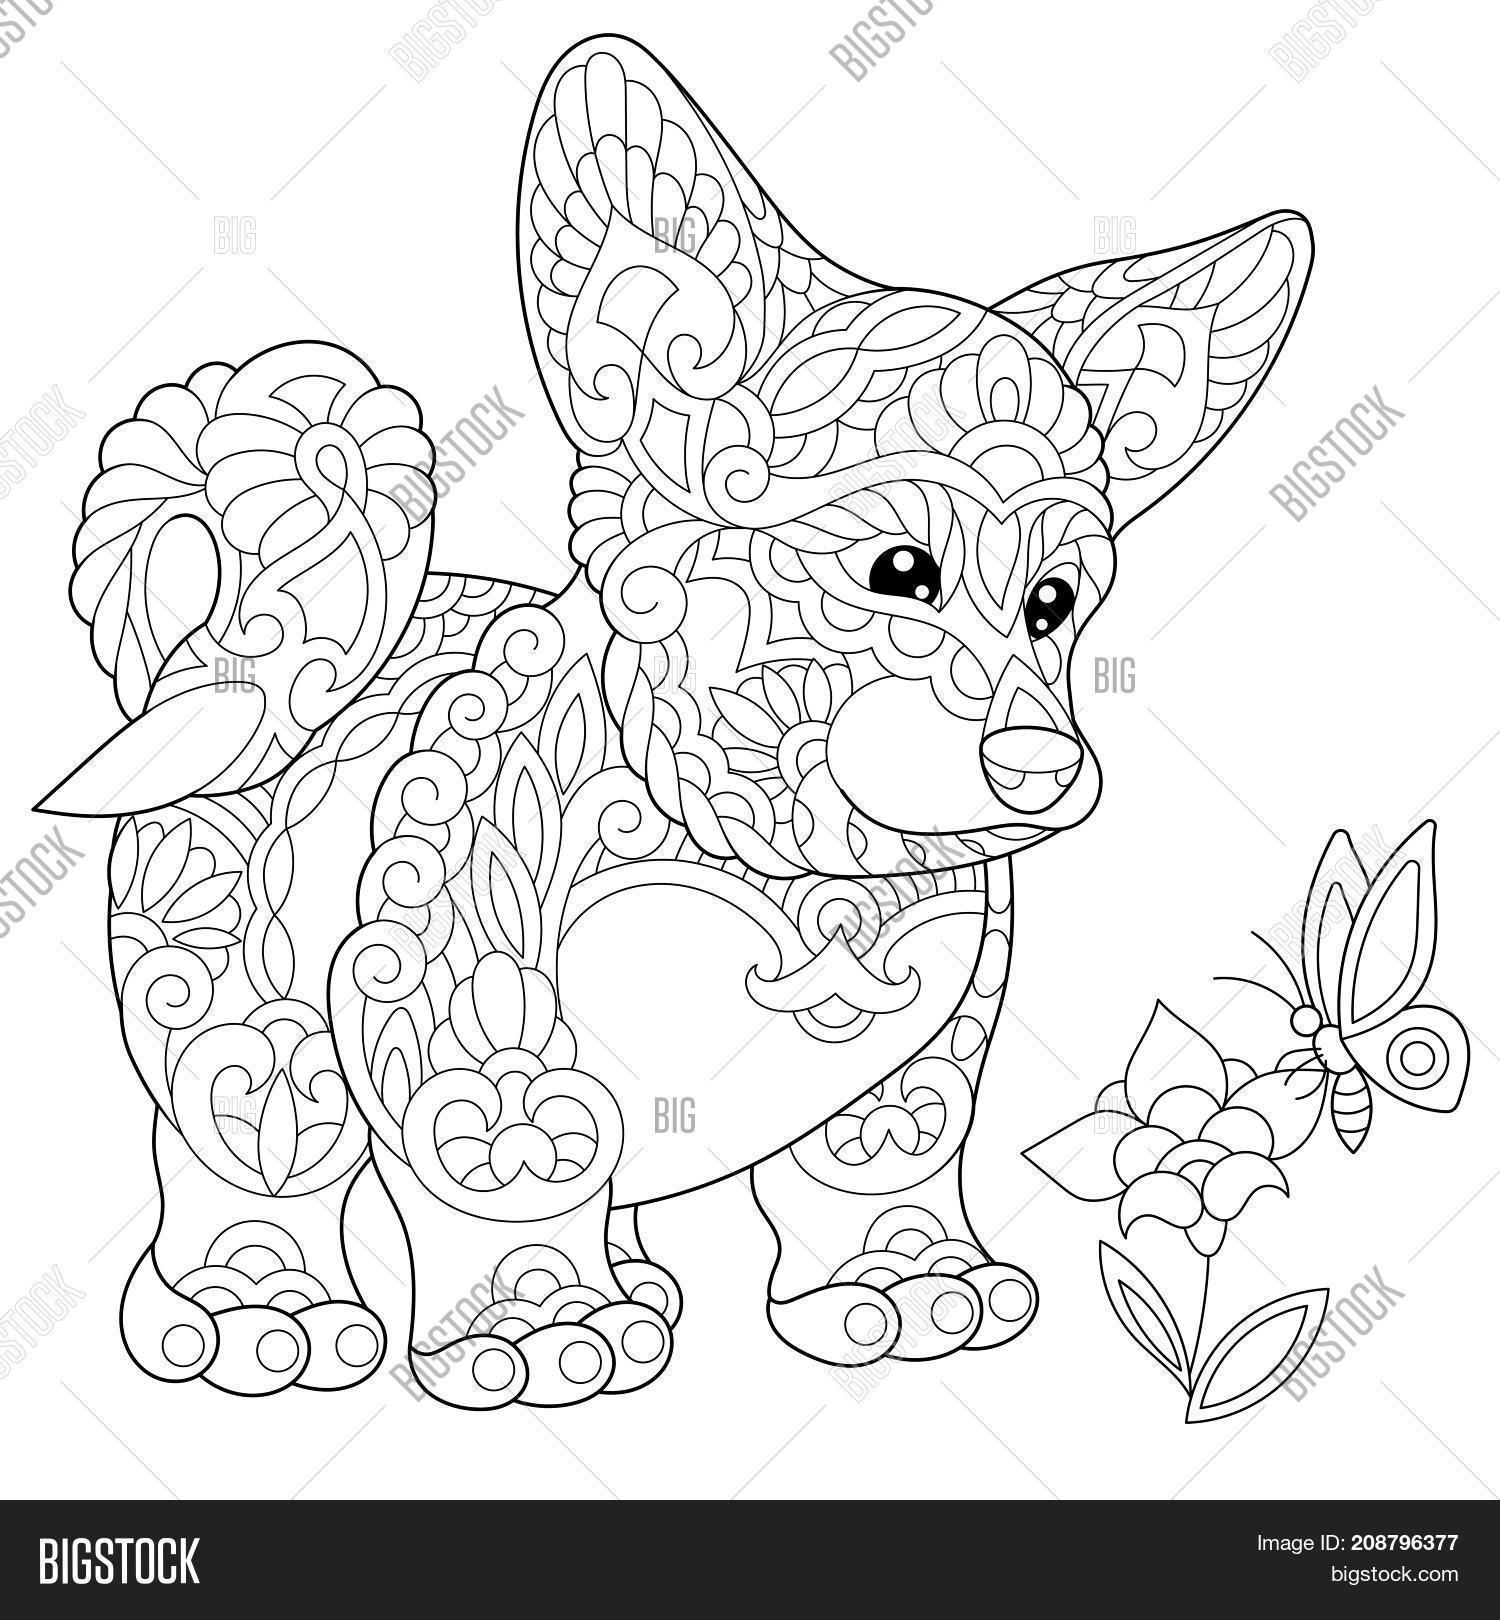 1500x1620 Coloring Page Welsh Corgi, Dog Image Amp Photo Bigstock